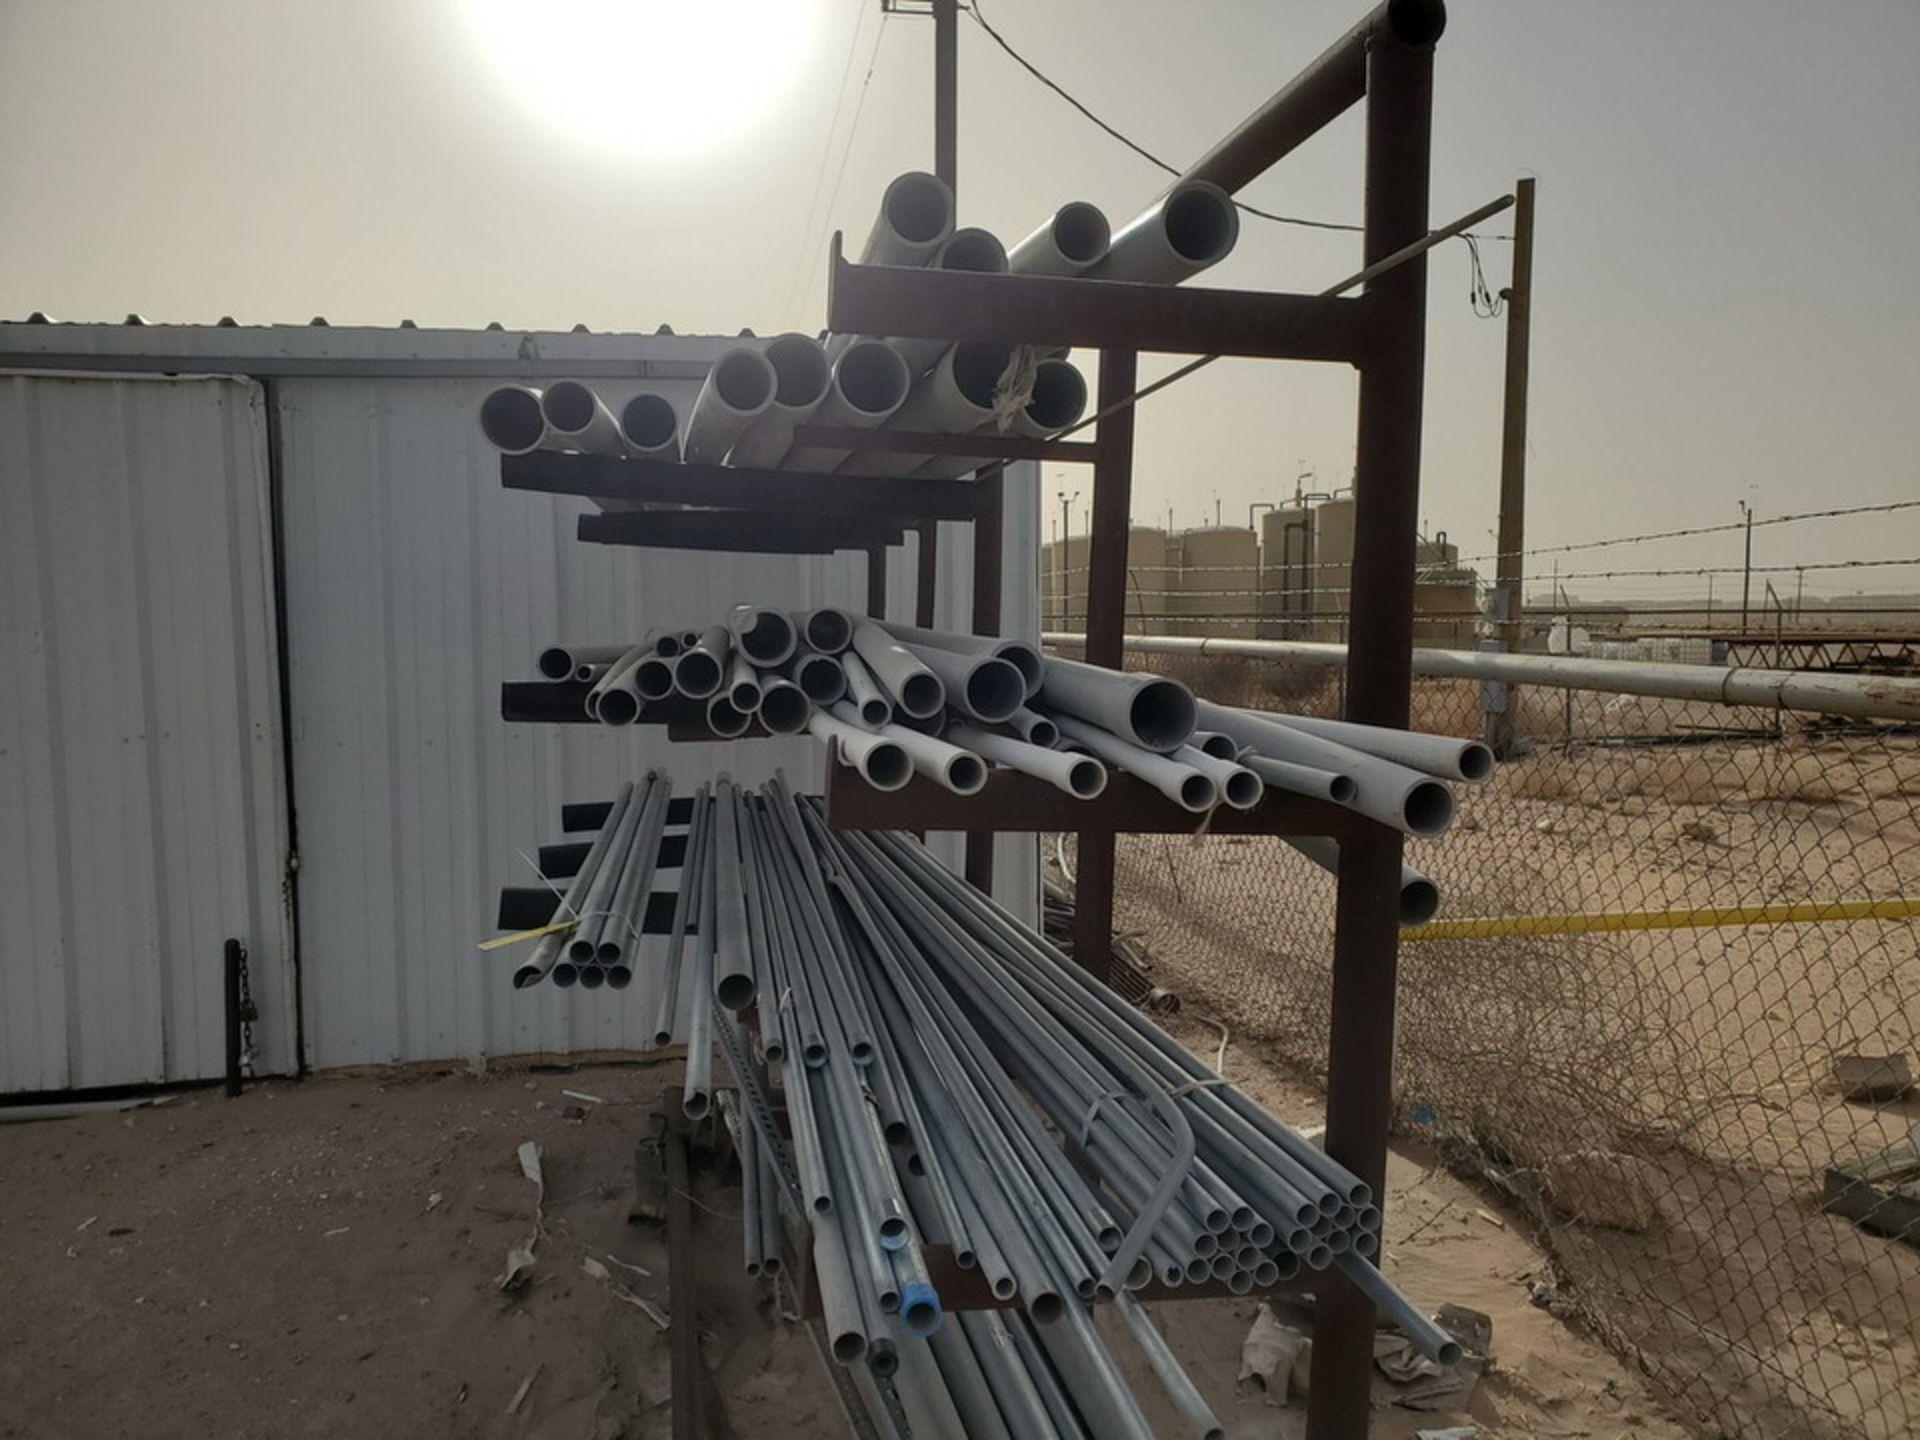 "PVC & Alum. Pipe W/ Conduit Size Range: 1/2"" - 4"" W/ Rack - Image 4 of 18"